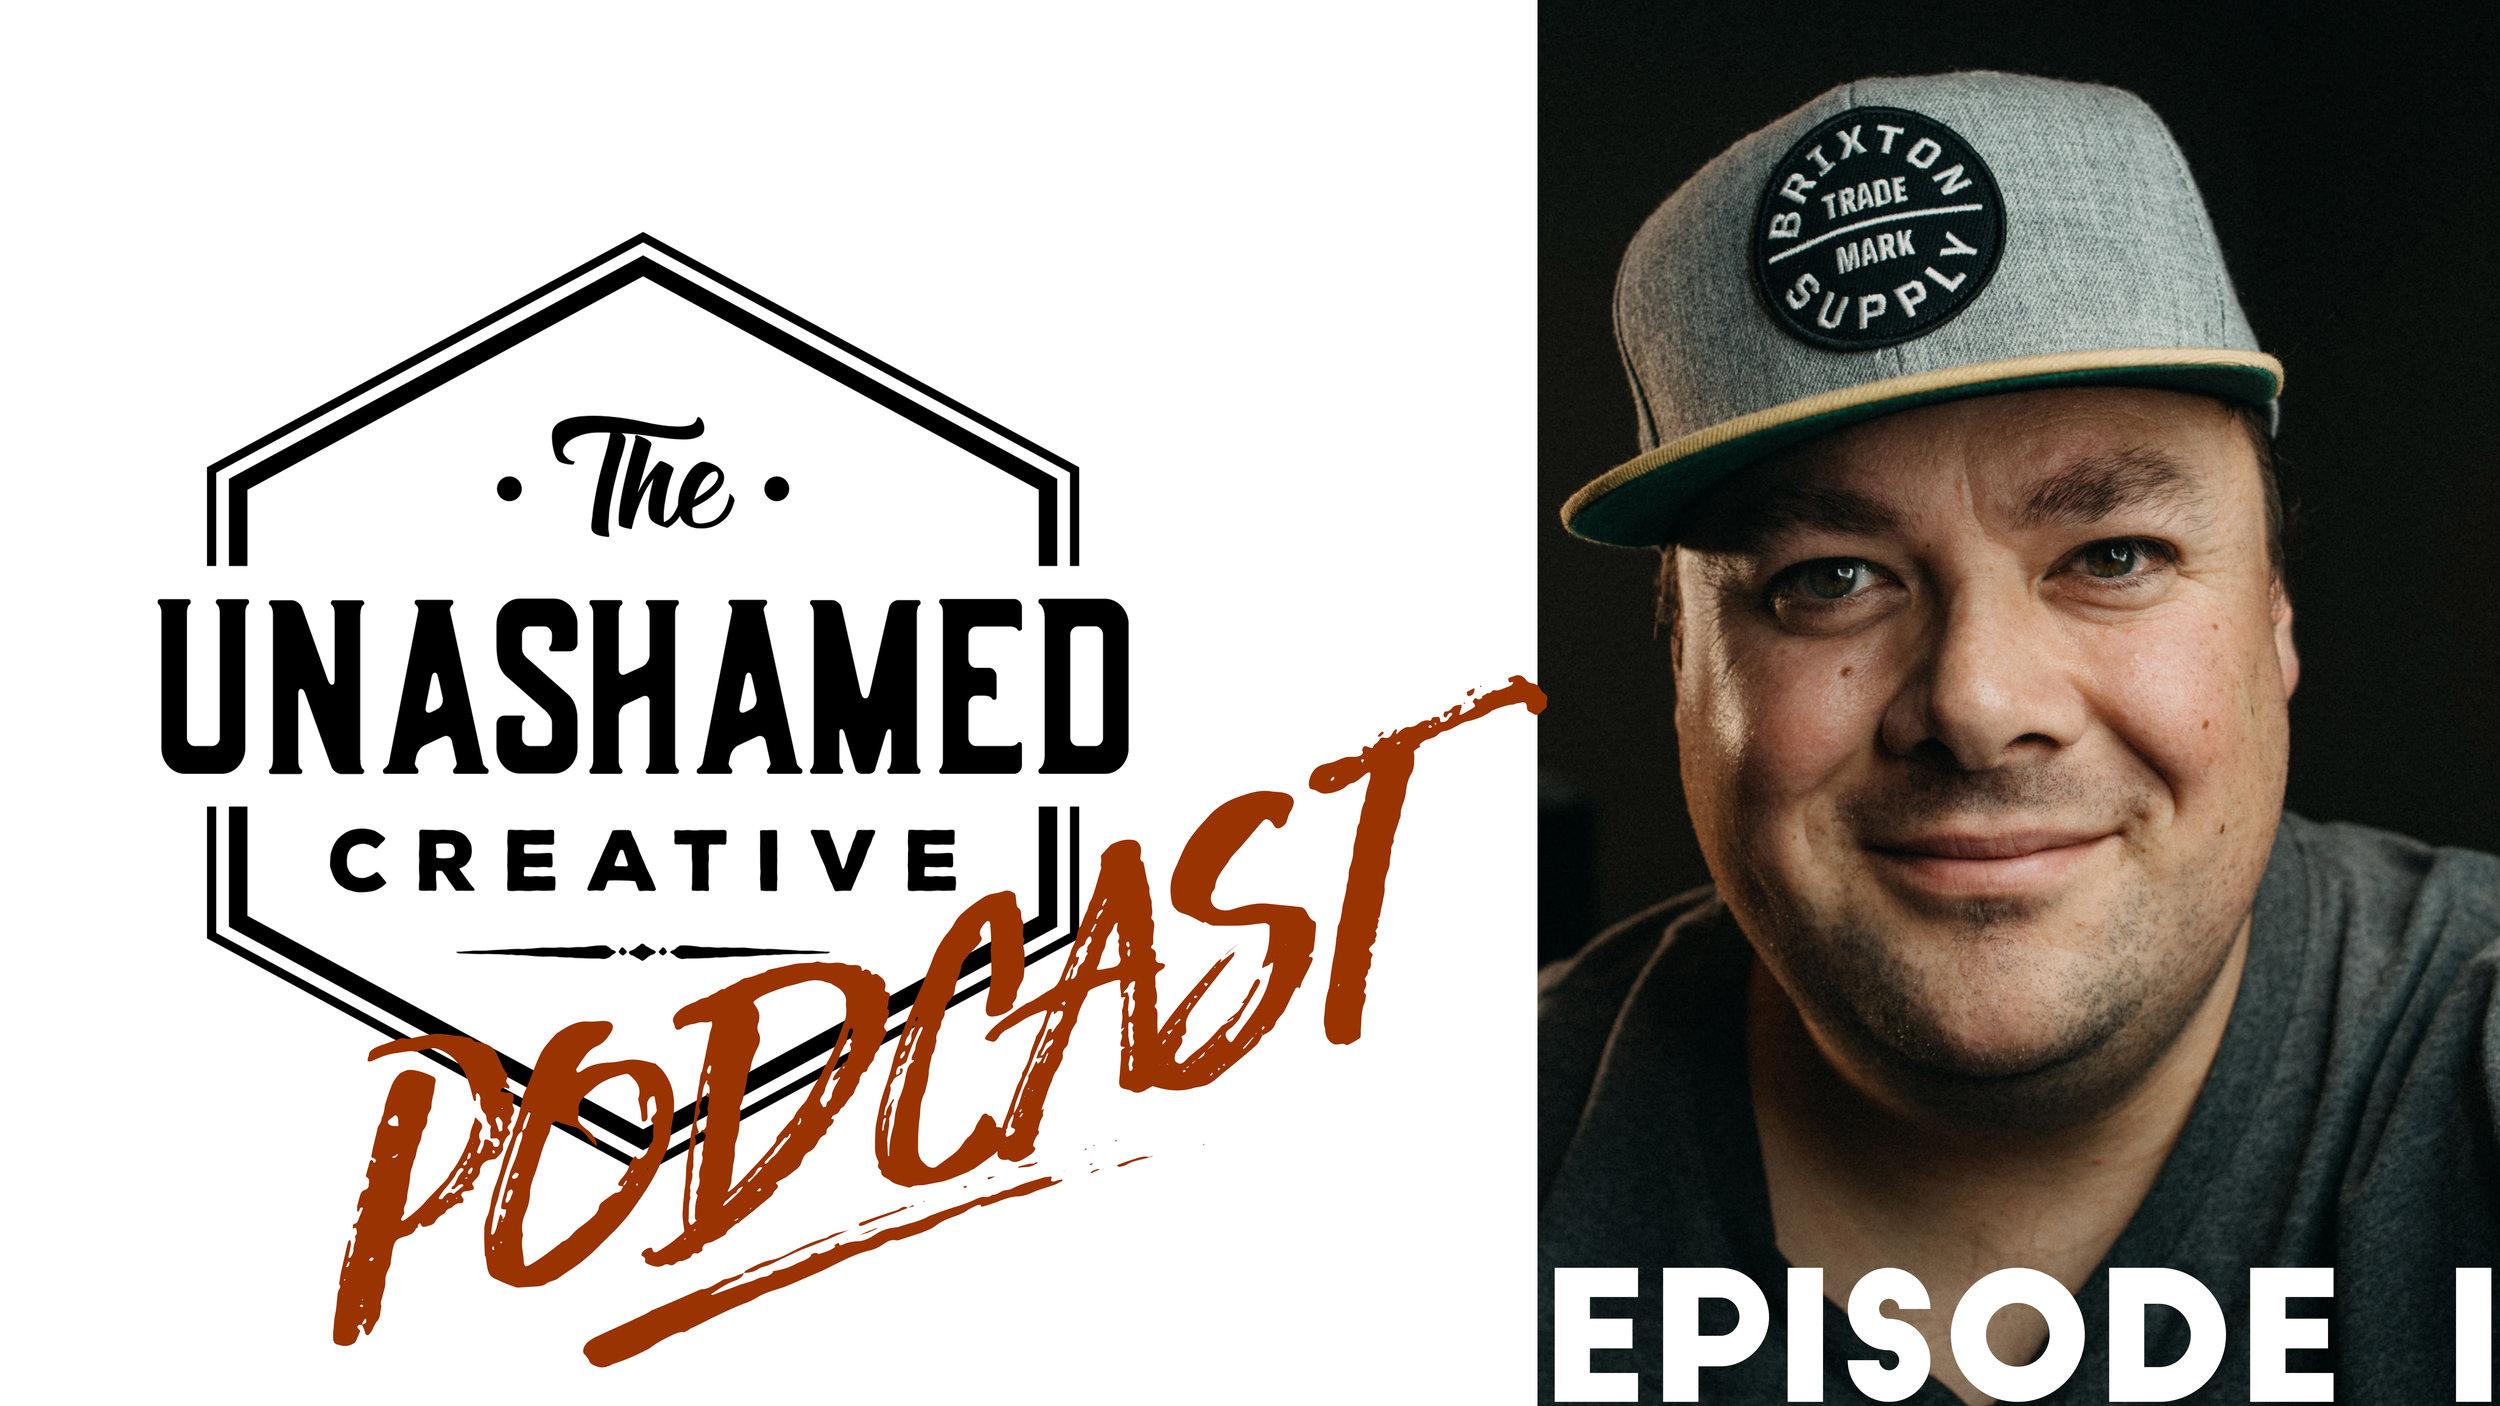 The Unashamed Creative Podcast Episode 1